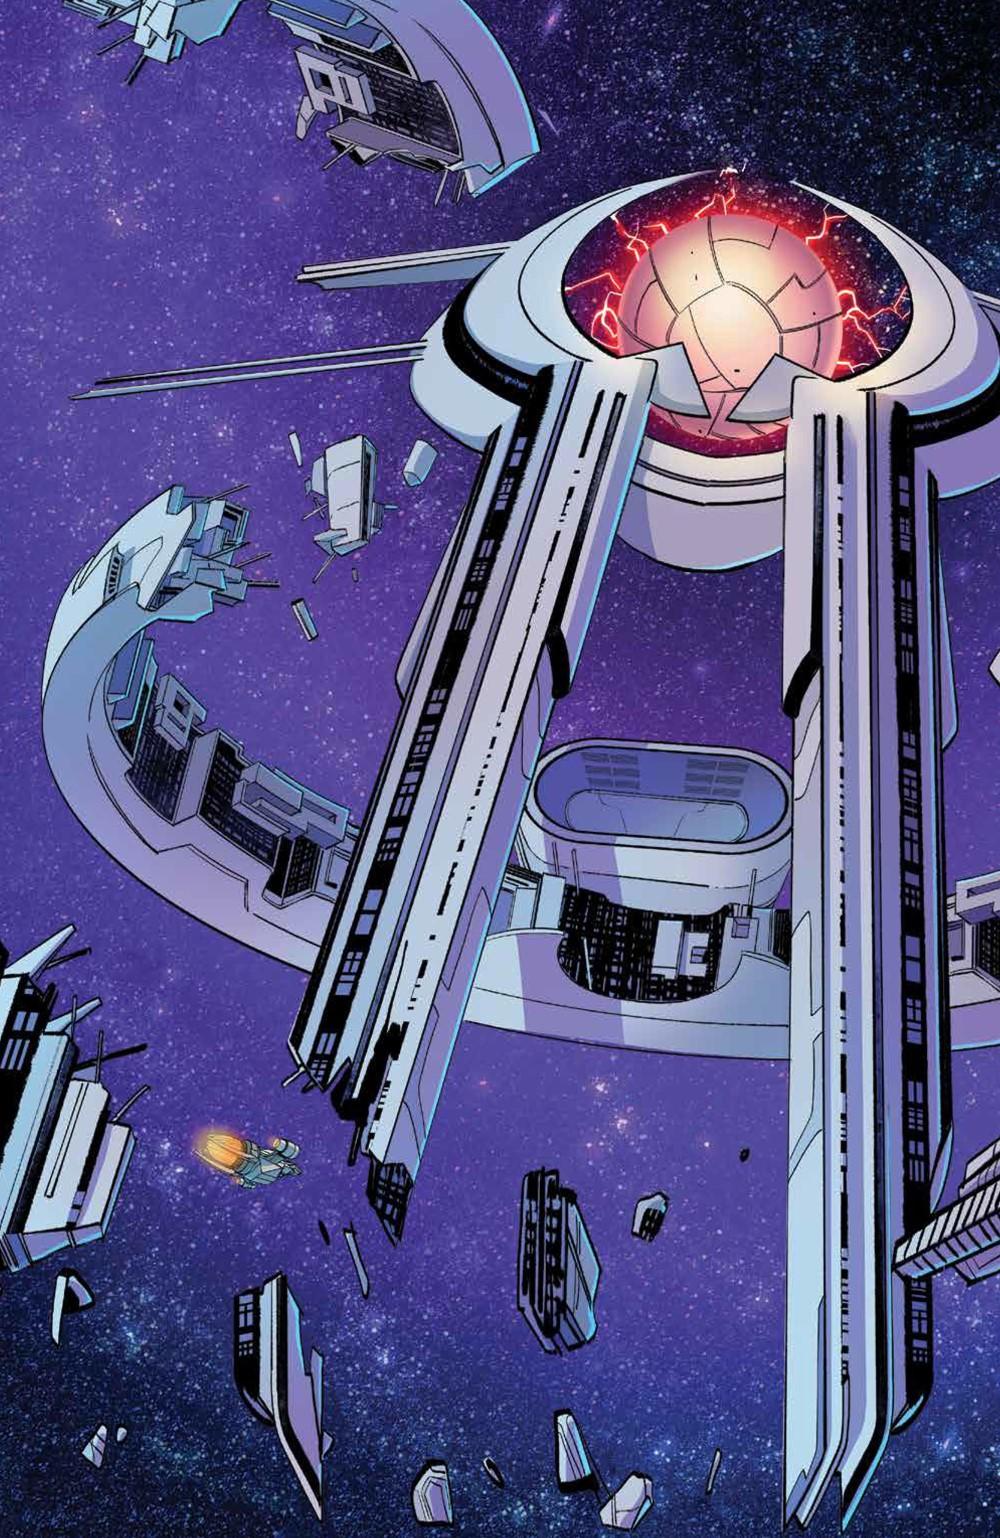 Firefly_BrandNewVerse_006_PRESS_4 ComicList Previews: FIREFLY BRAND NEW 'VERSE #6 (OF 6)